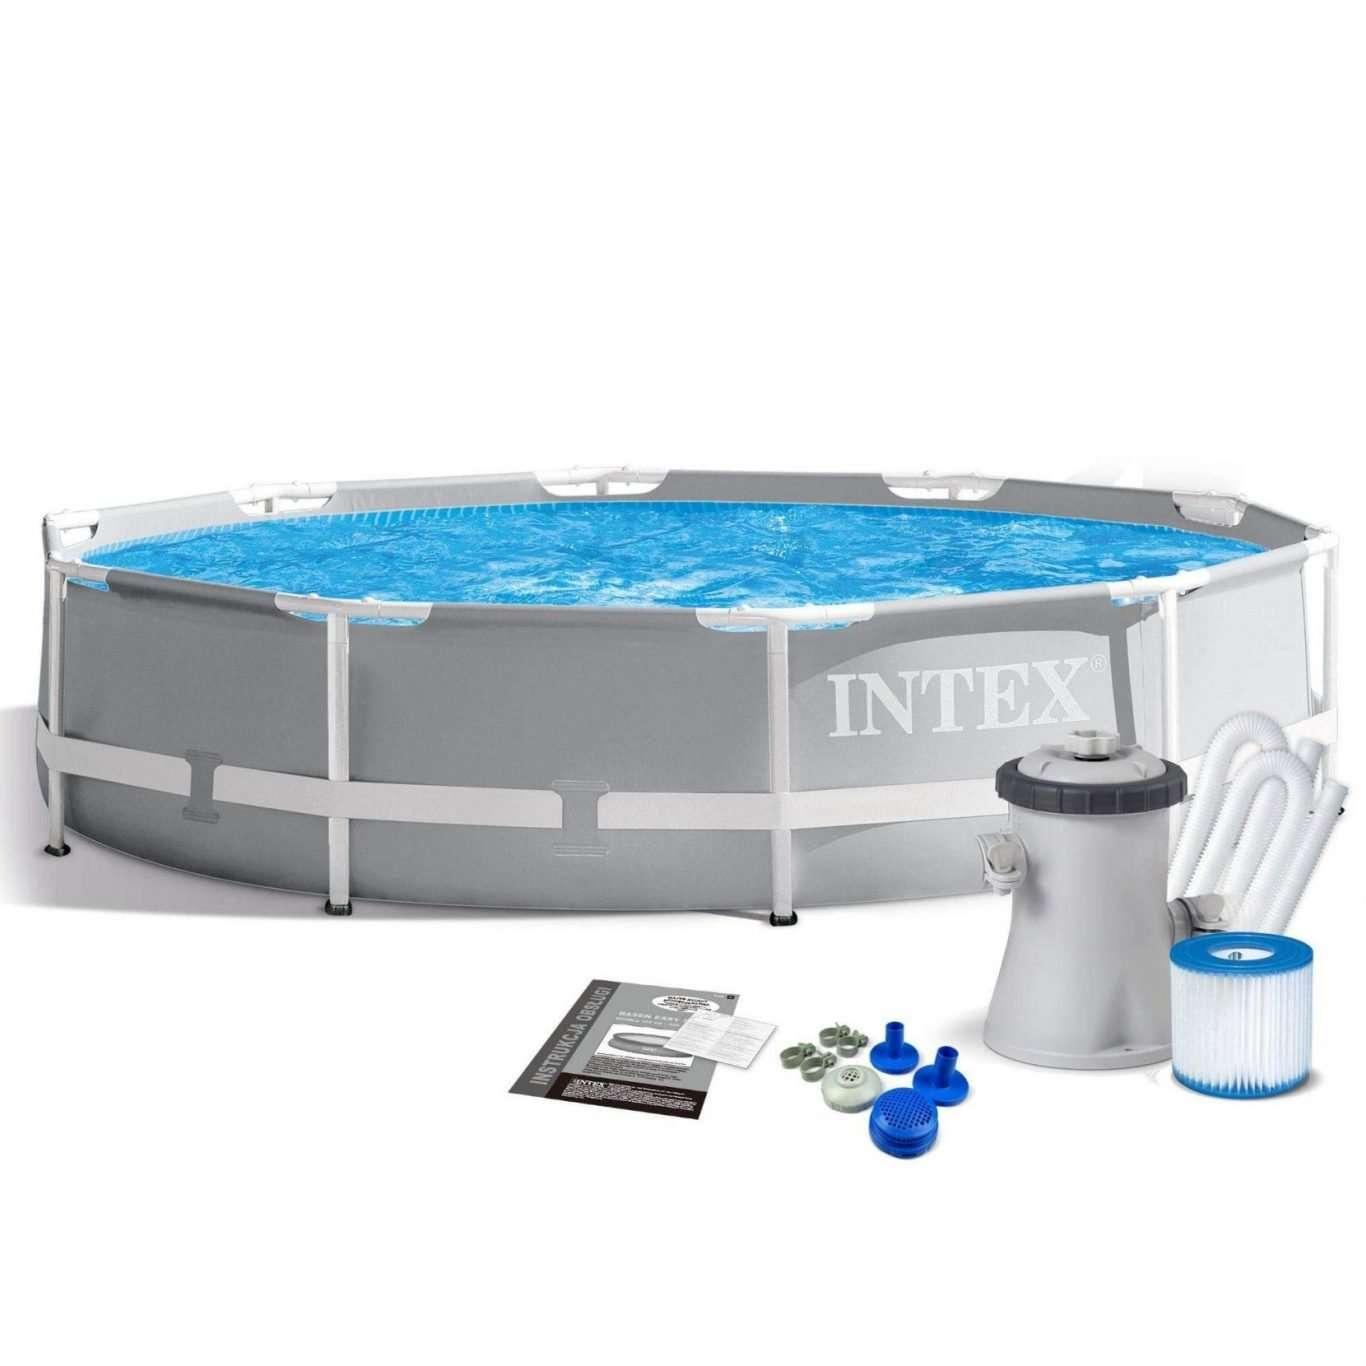 INTEX Swimming Pool – 26702